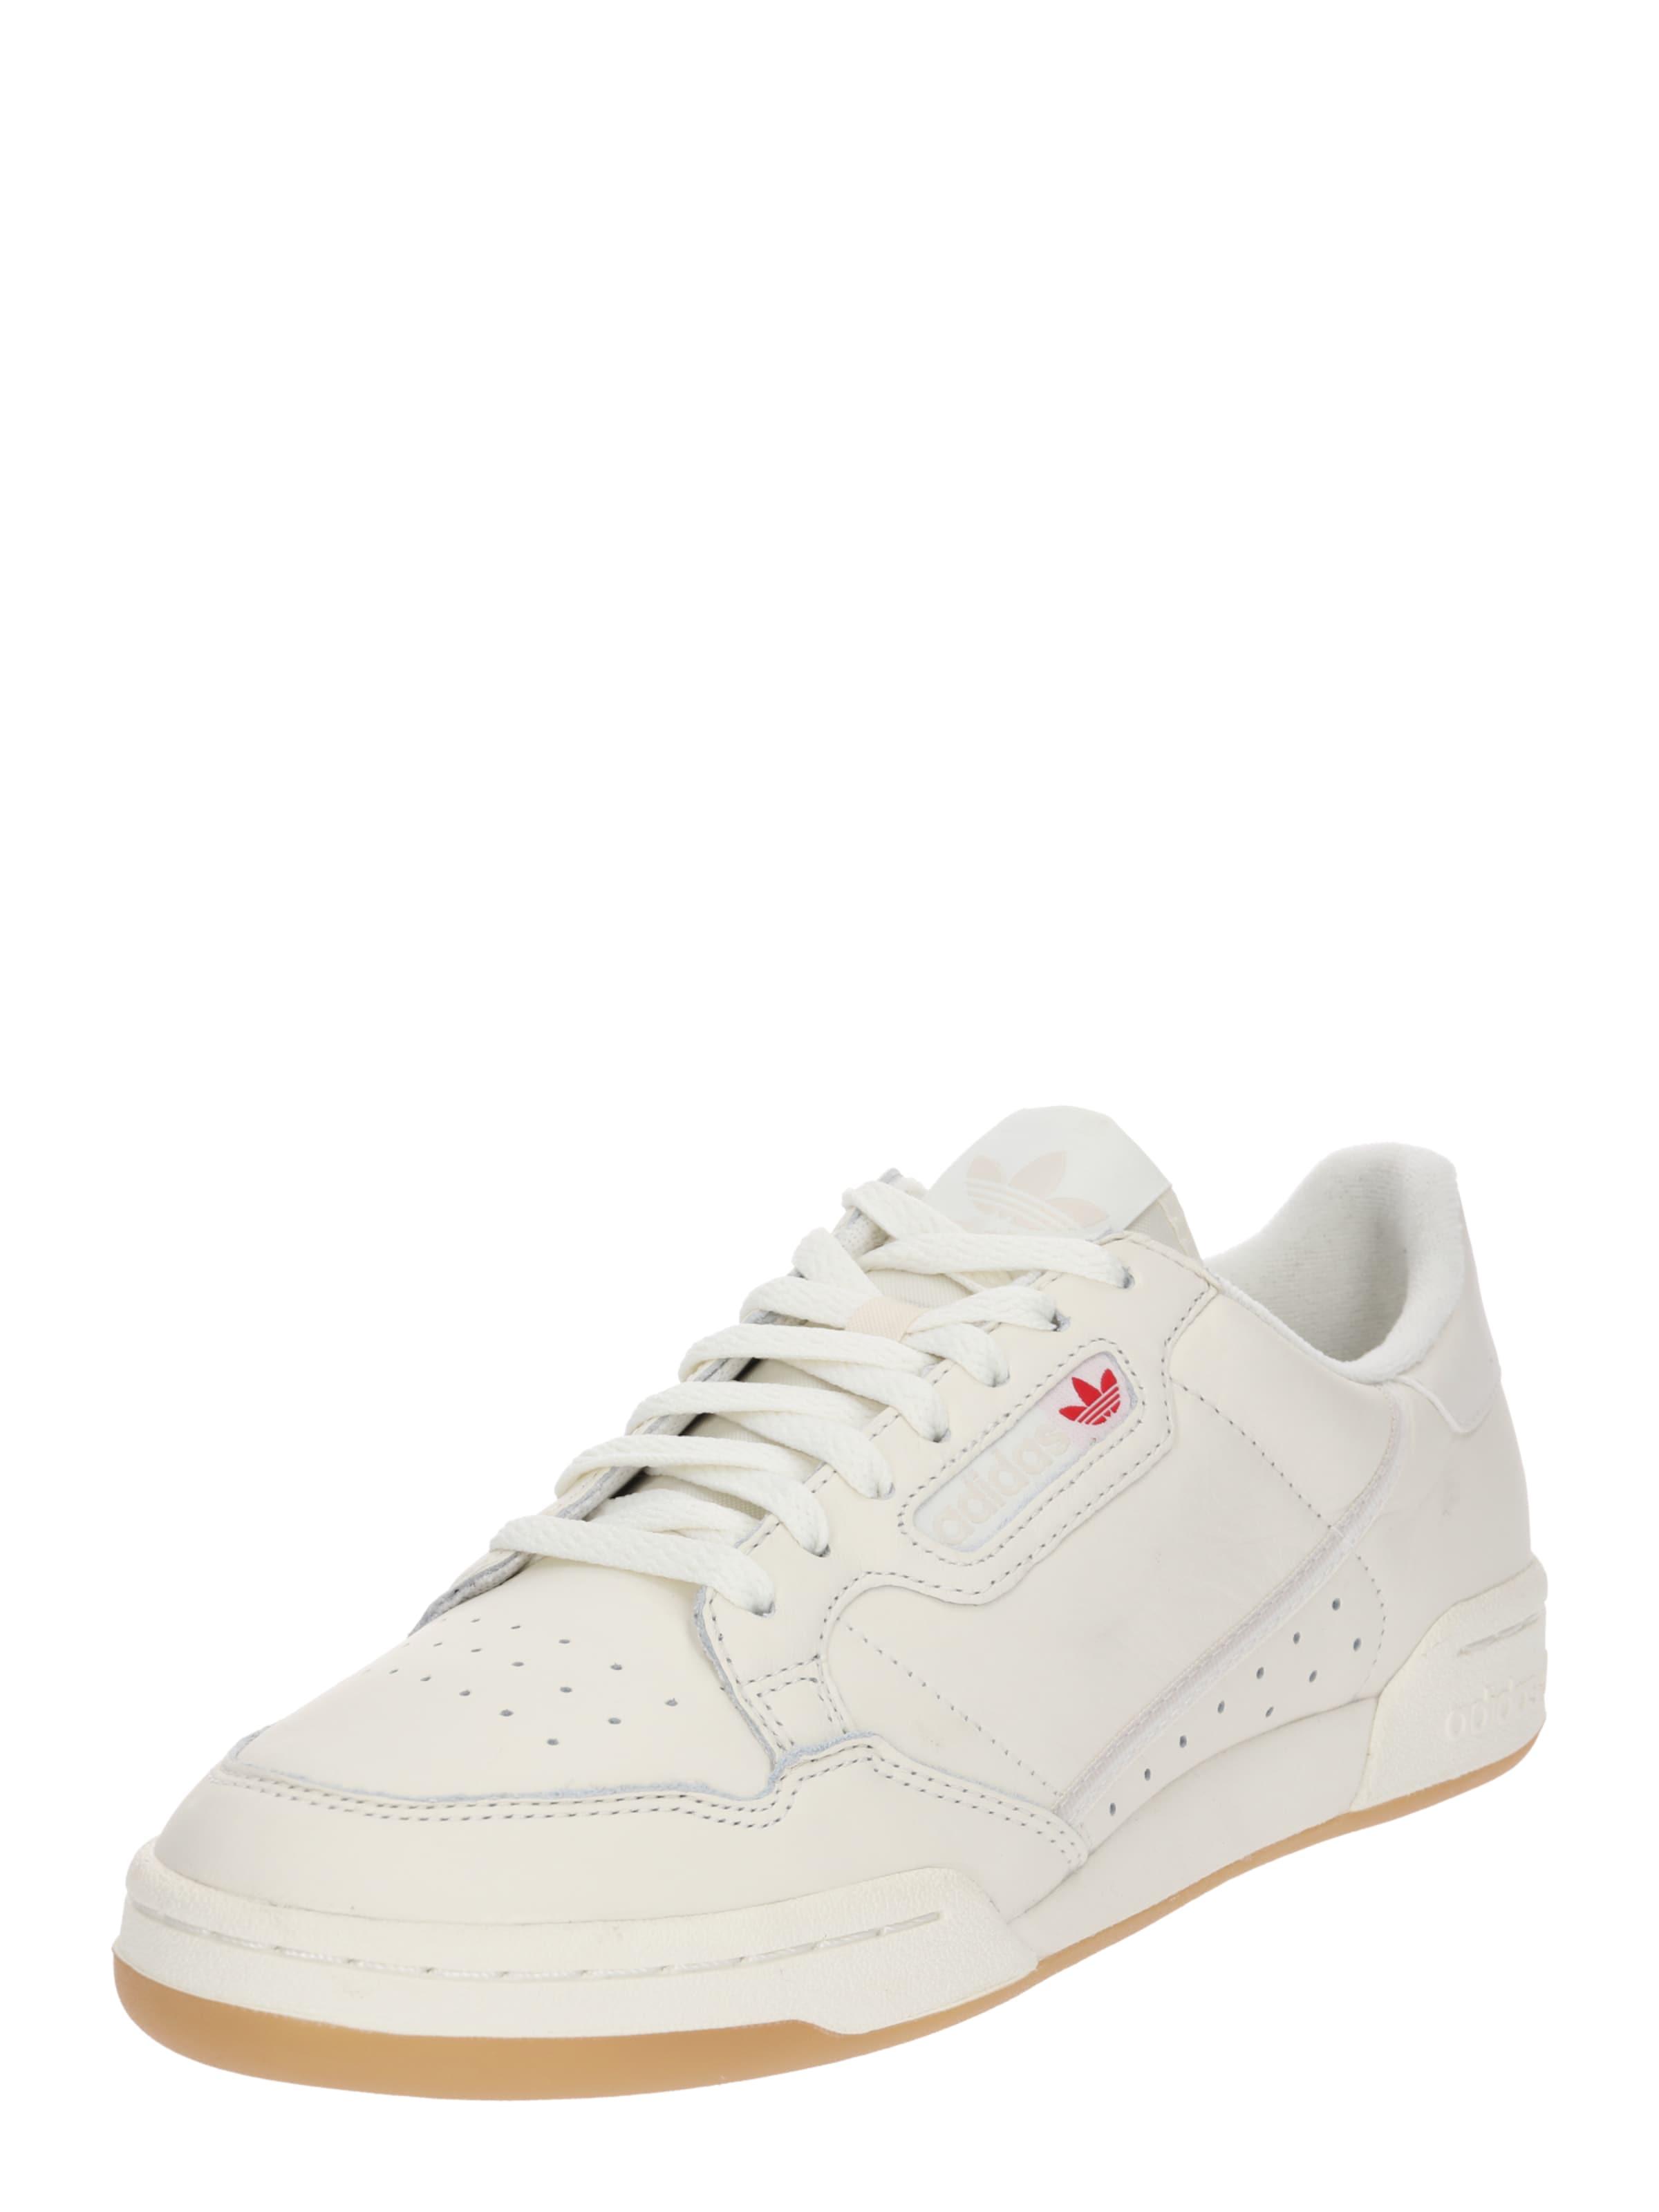 NavyRot In Weiß Adidas Originals Sneaker 80' 'continental IWD29EH